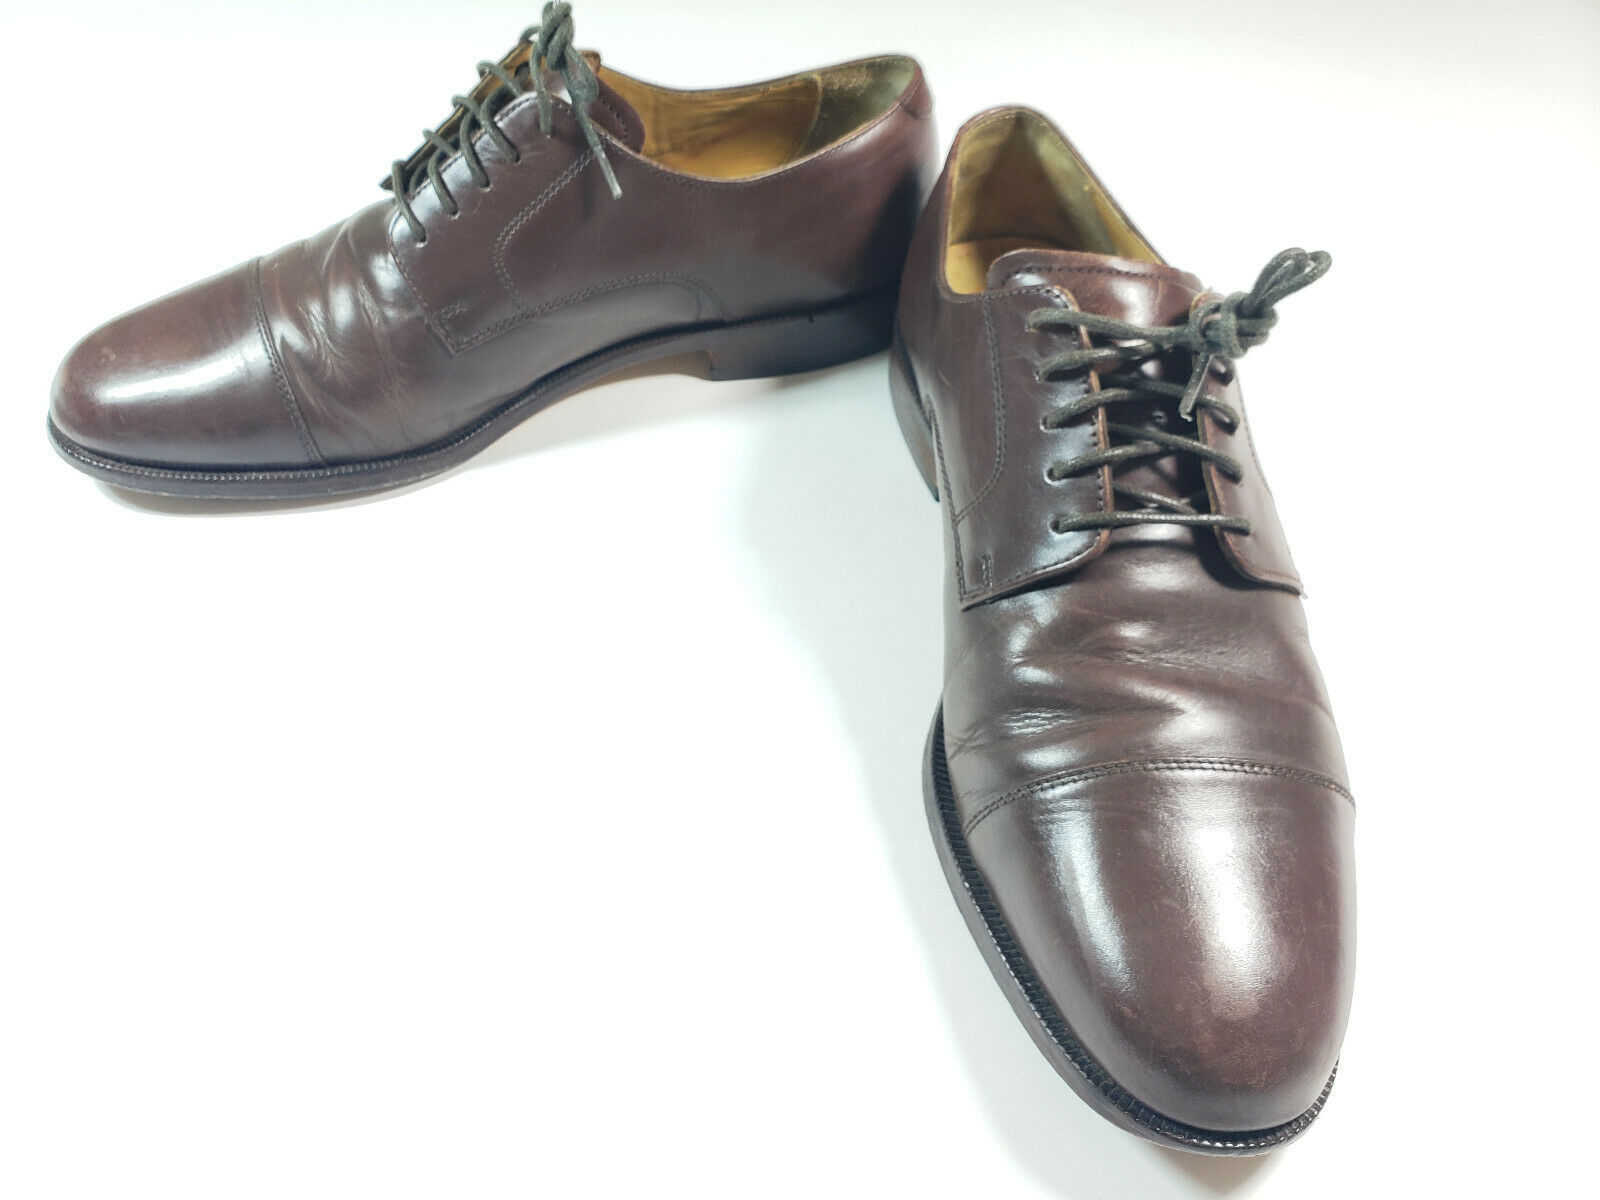 Cole Haan Mens shoes Cassady Cap Toe Derby Oxford Dress Brown C07992 Size 10.5